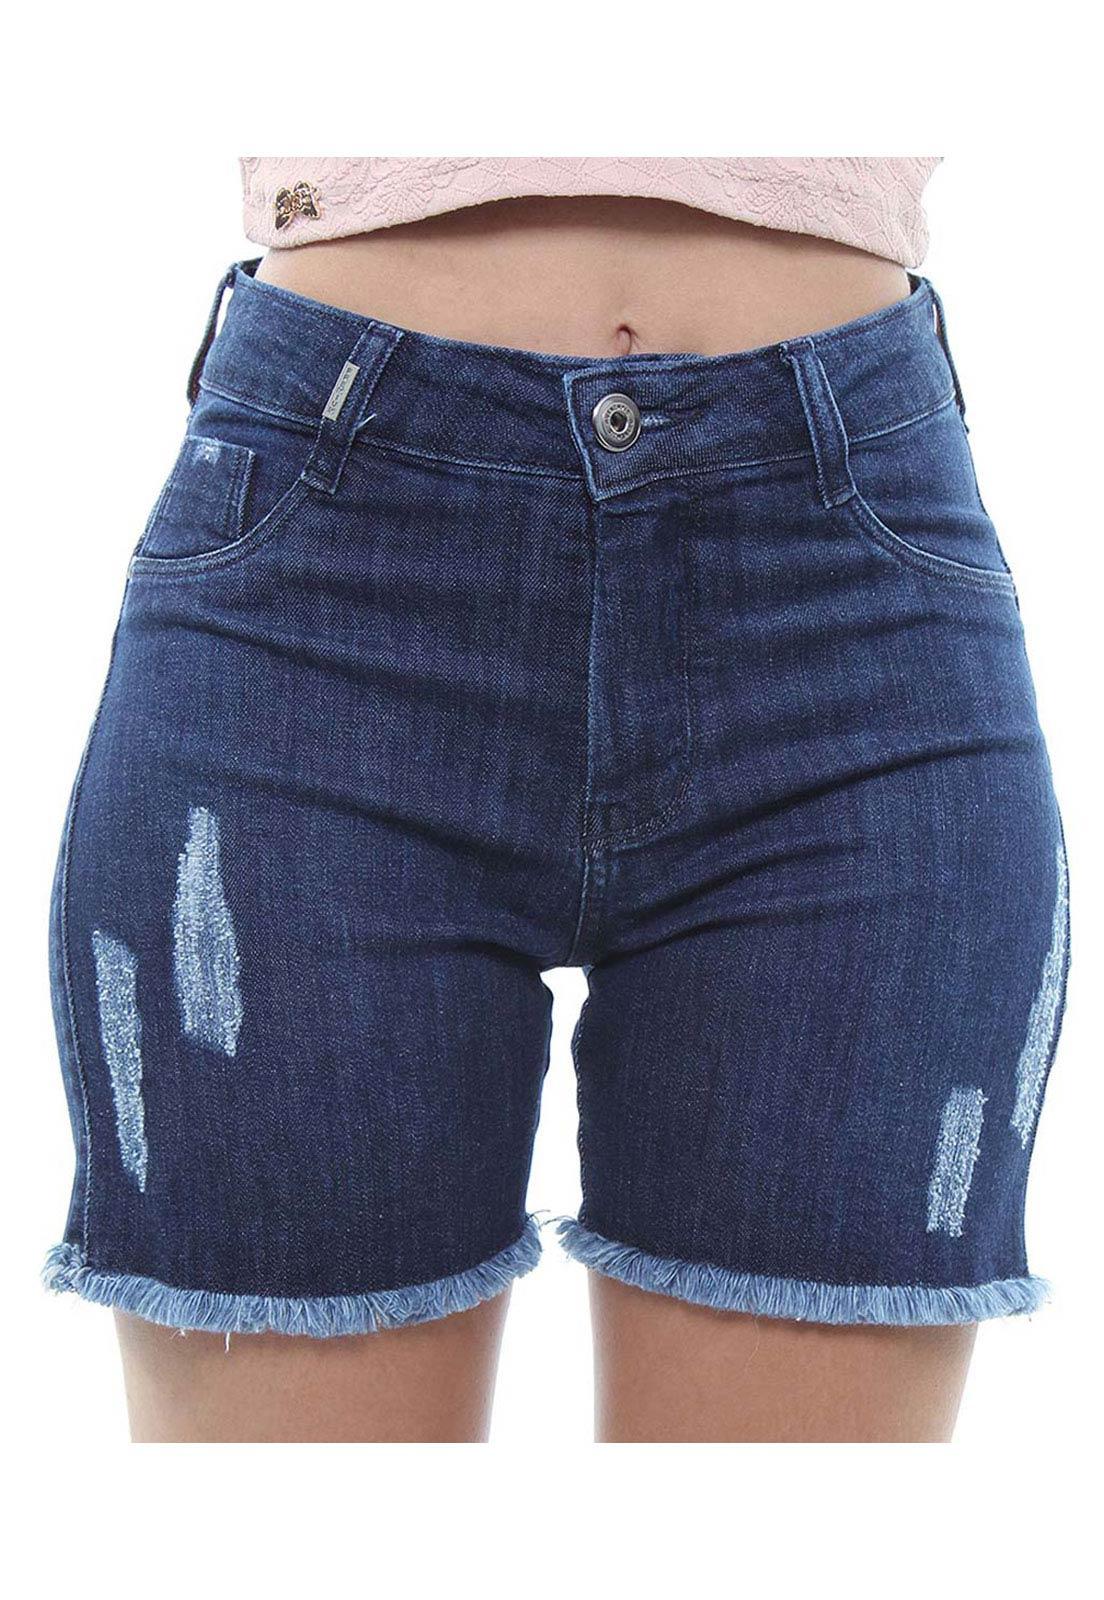 Bermuda Ciclista Jeans Feminina Com Barra Desfiada Crocker - 47914  - CROCKER JEANS